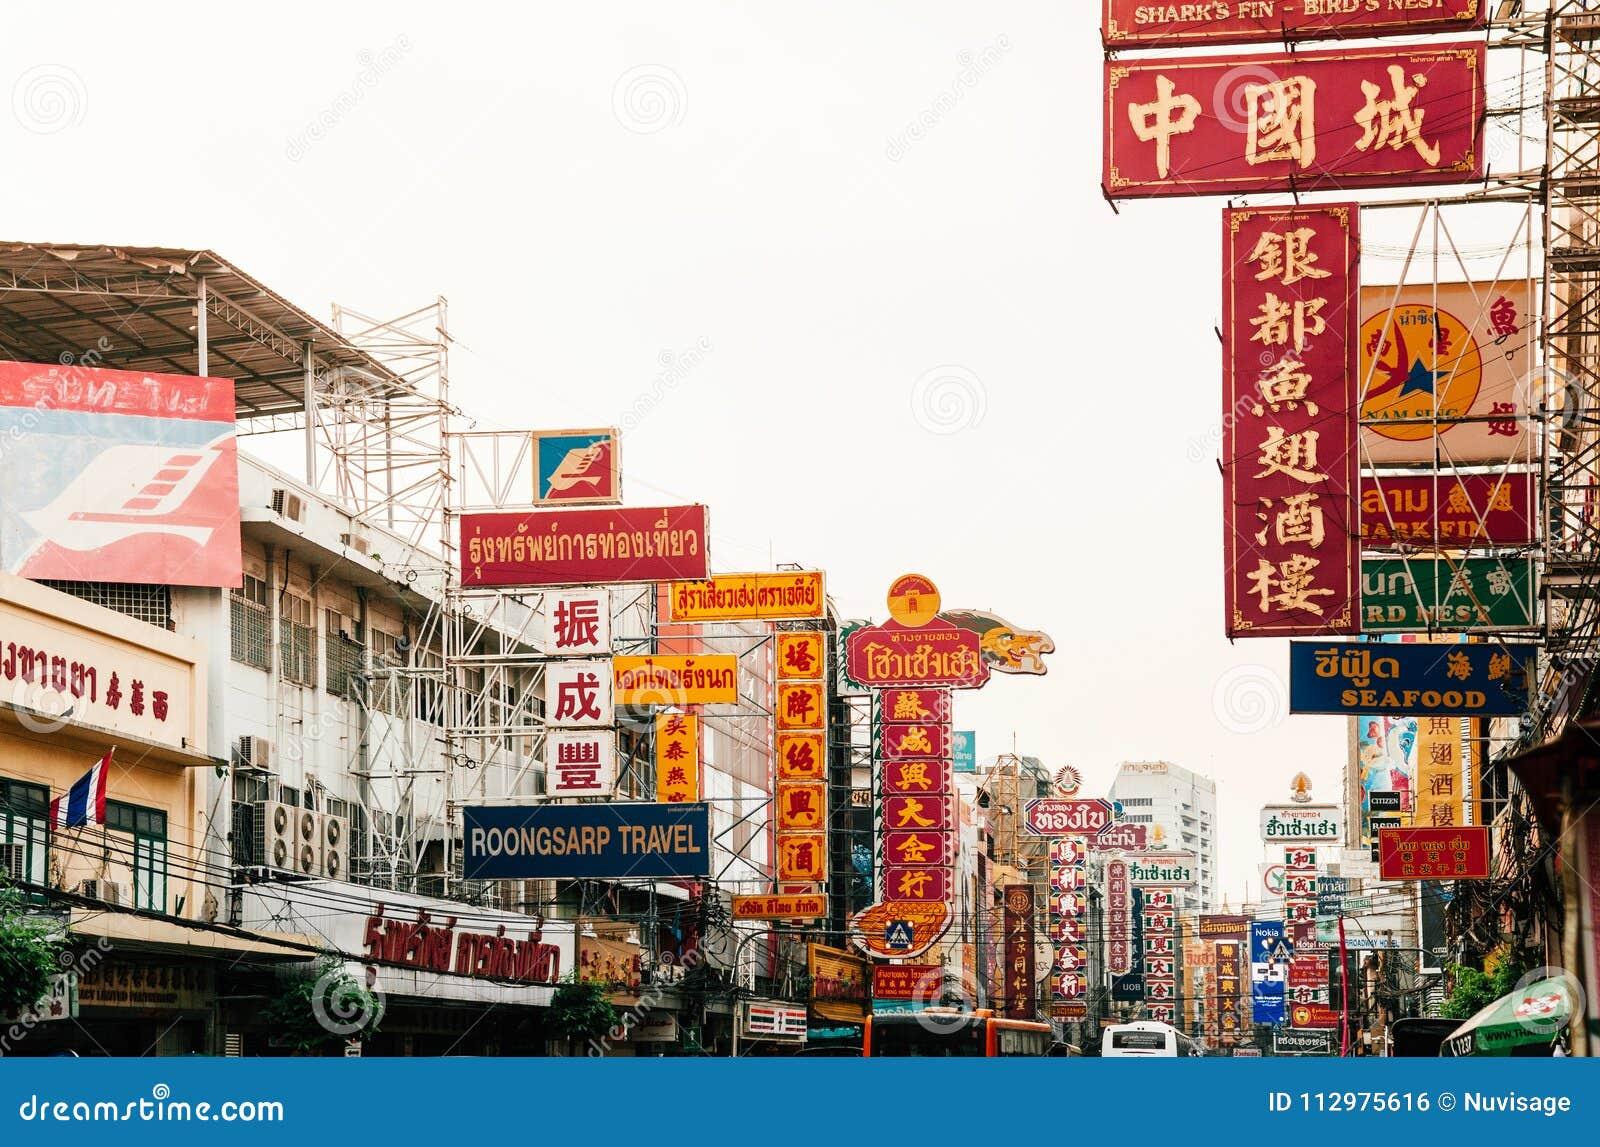 Shop signages of local business in Bangkok China town - Yaowarat